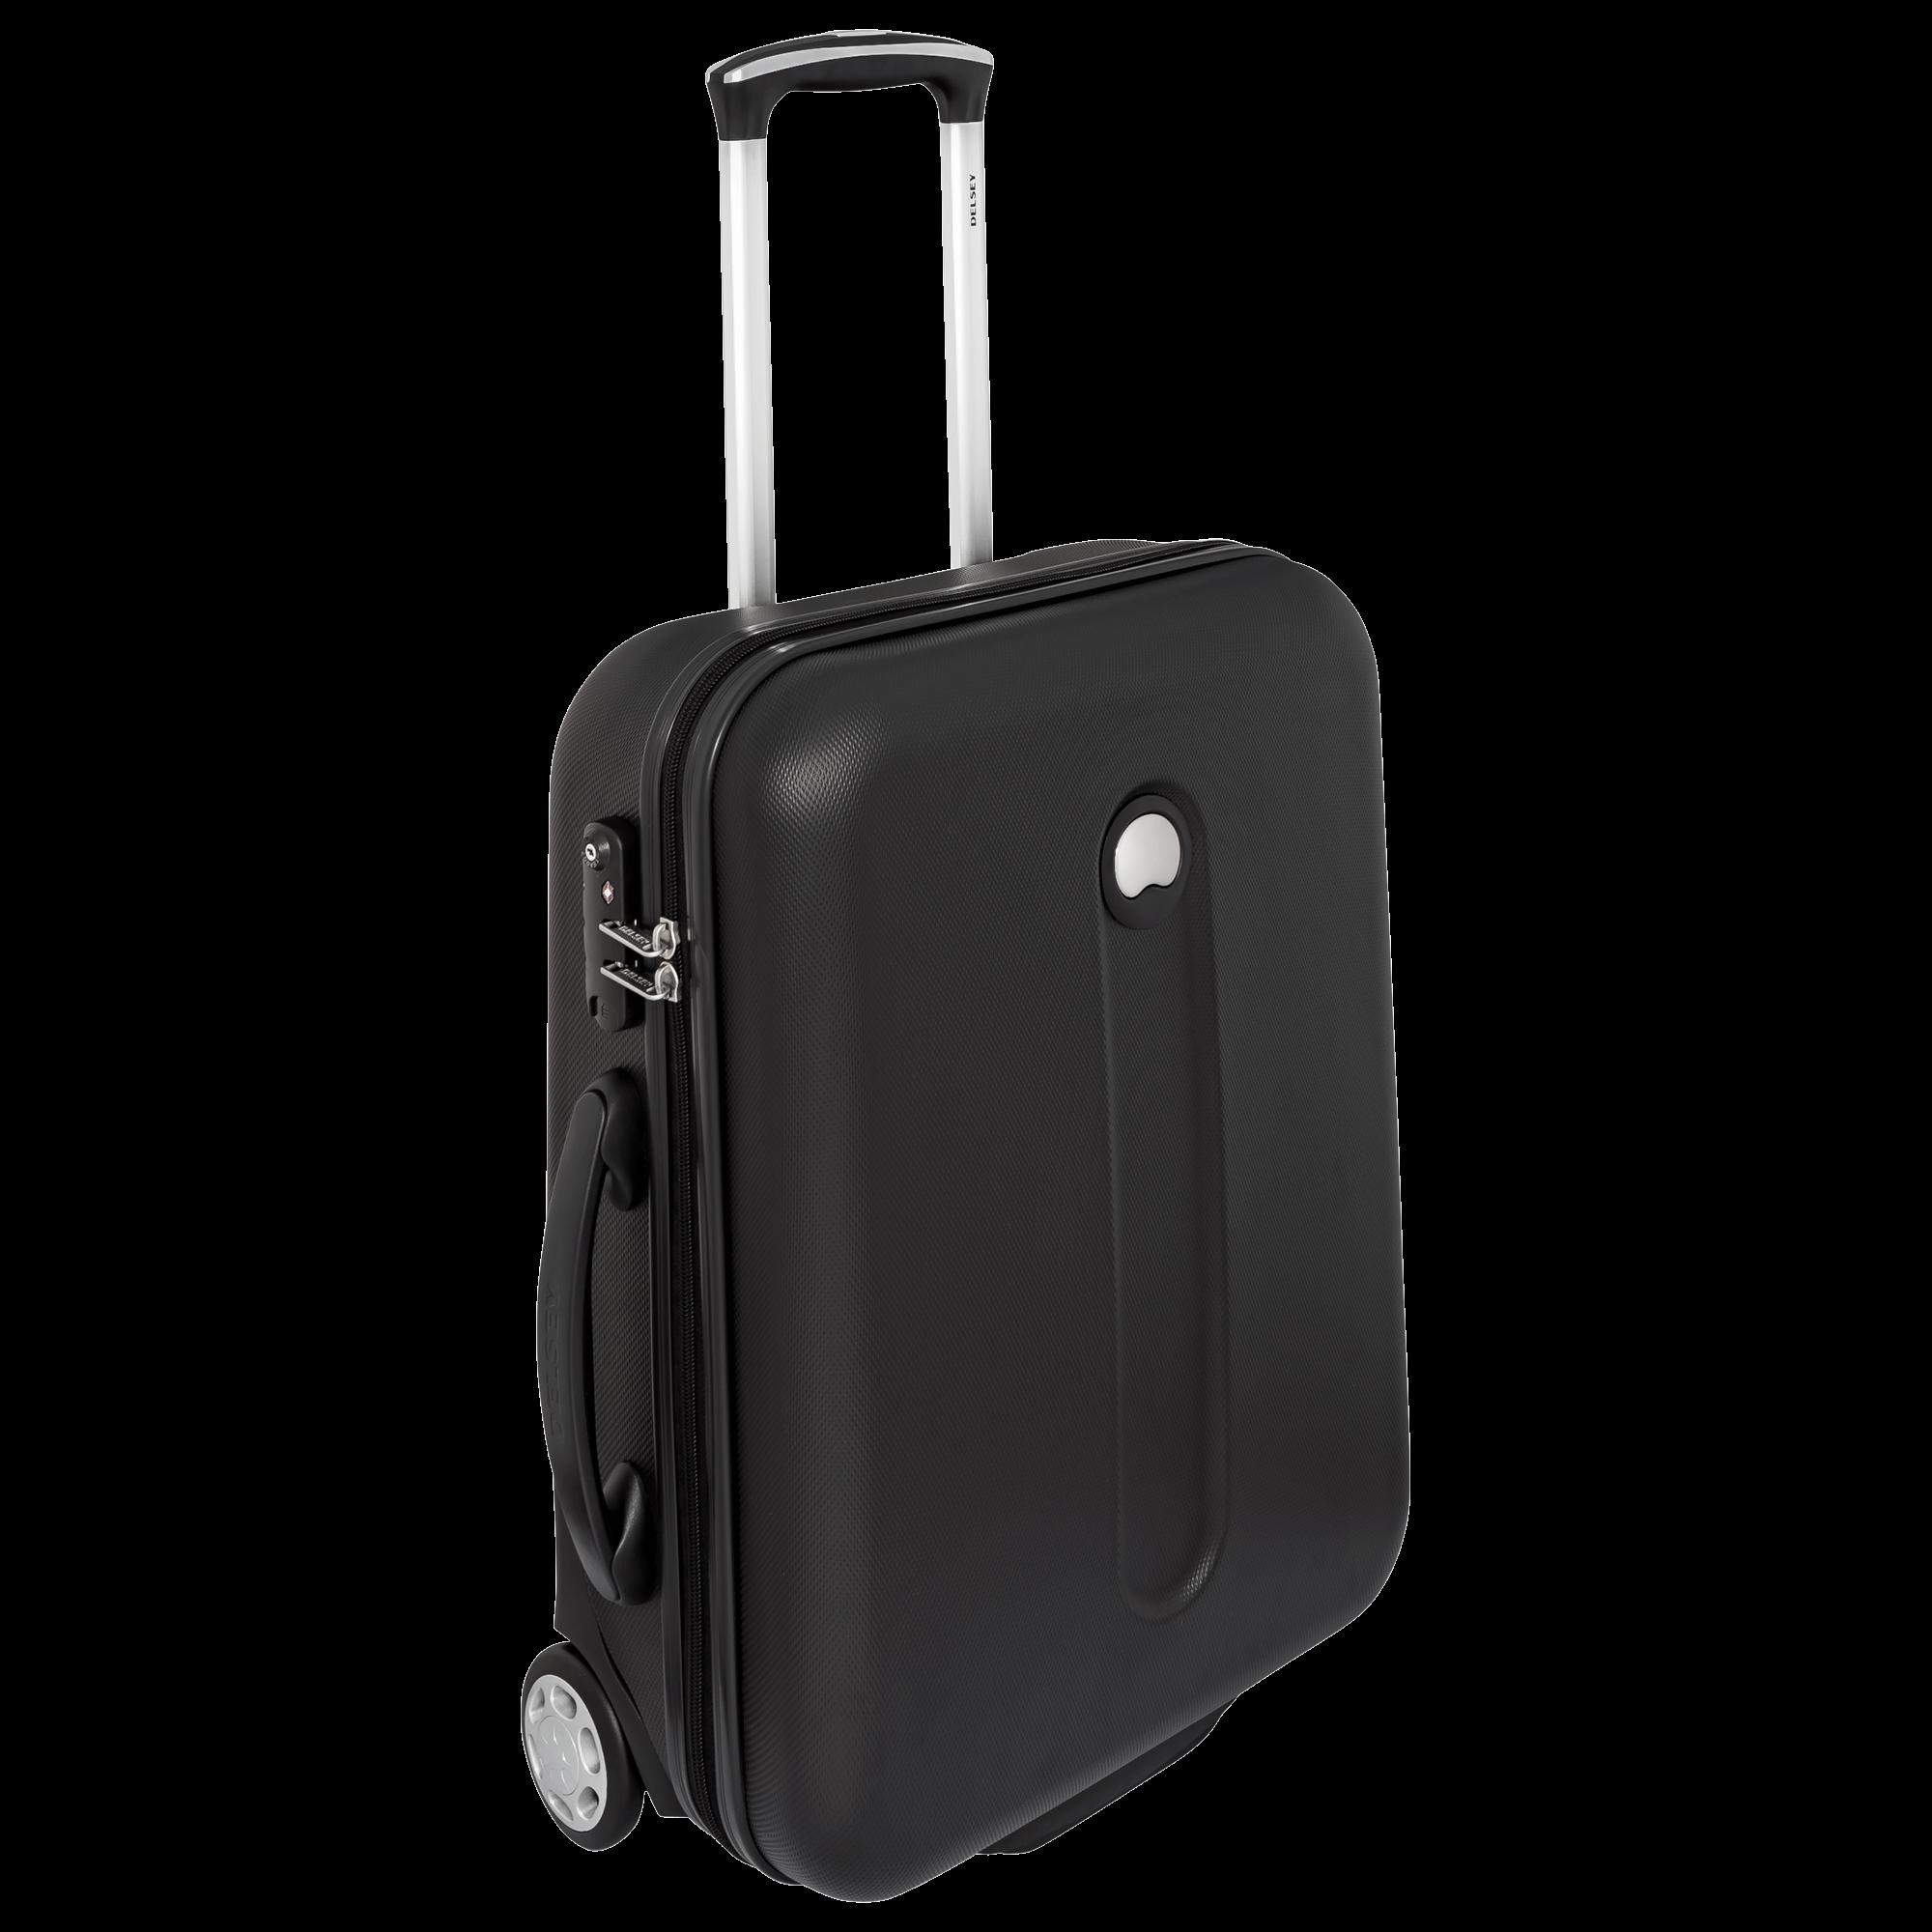 Black Luggage PNG Image.